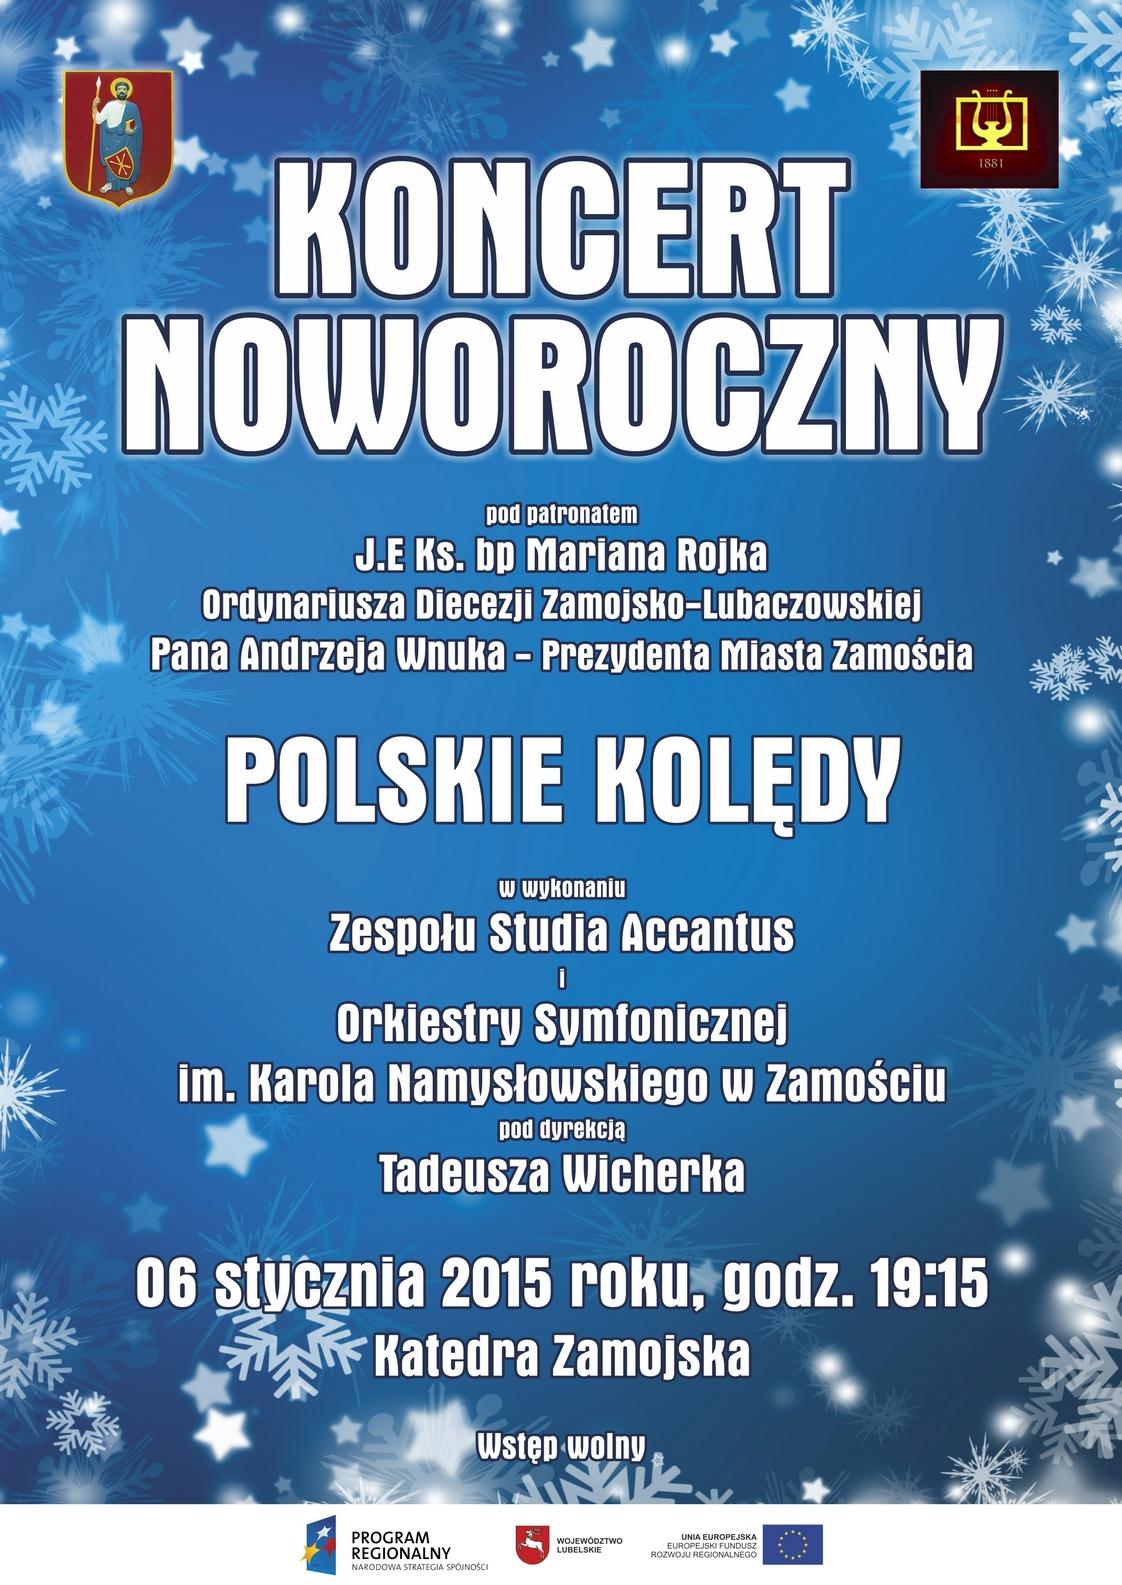 Koncert Noworoczny m